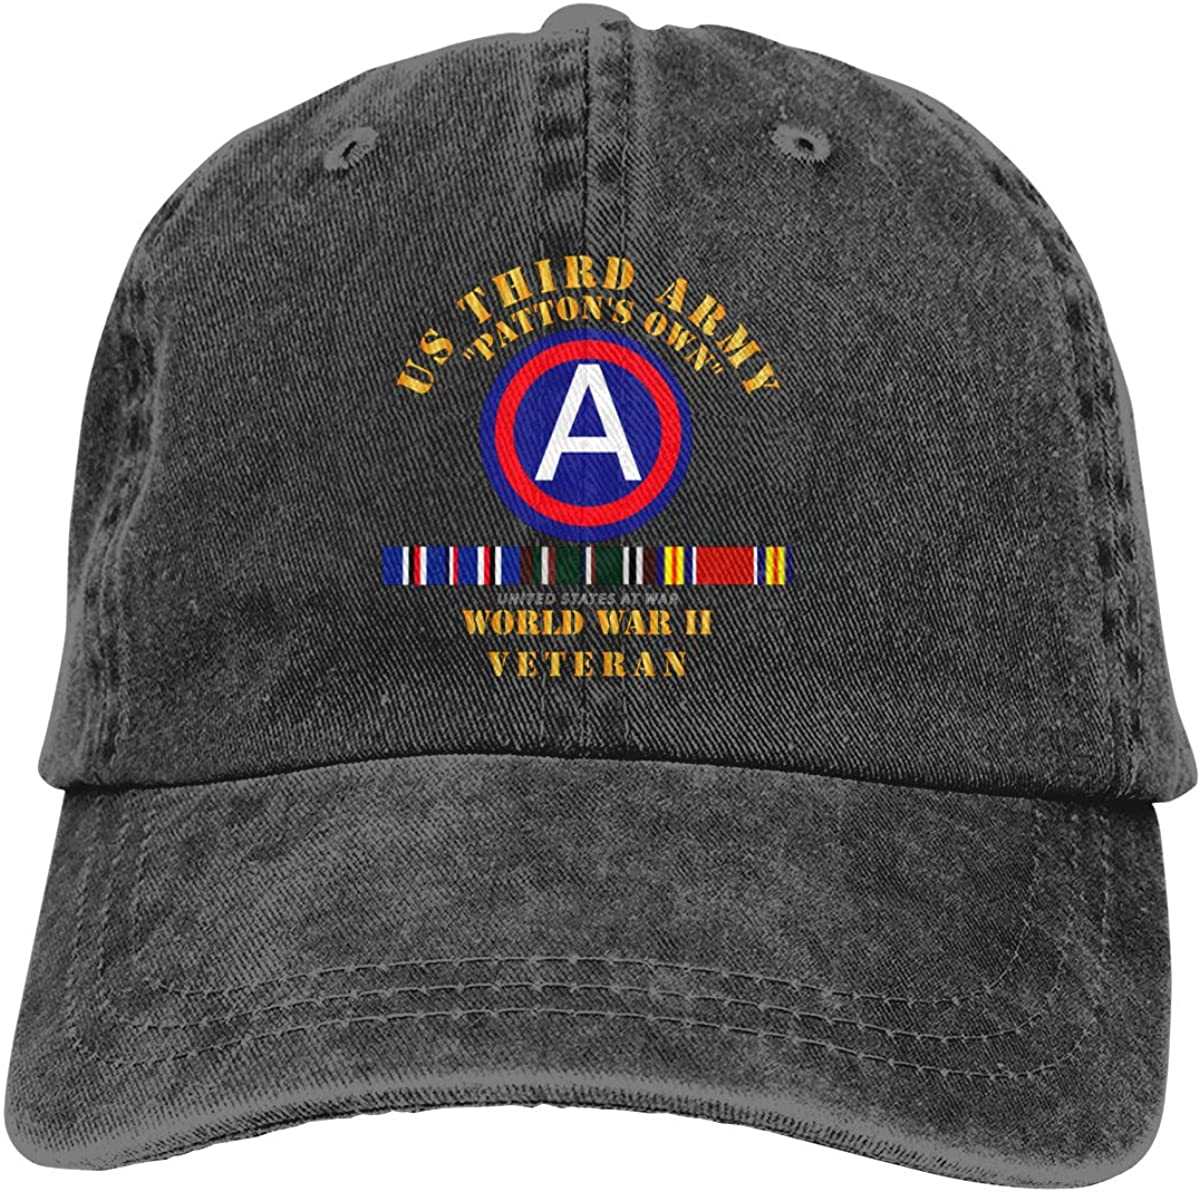 Army 3rd Us Army WWII W SVC Unisex Vintage Adjustable Baseball Cap Denim Dad Hat